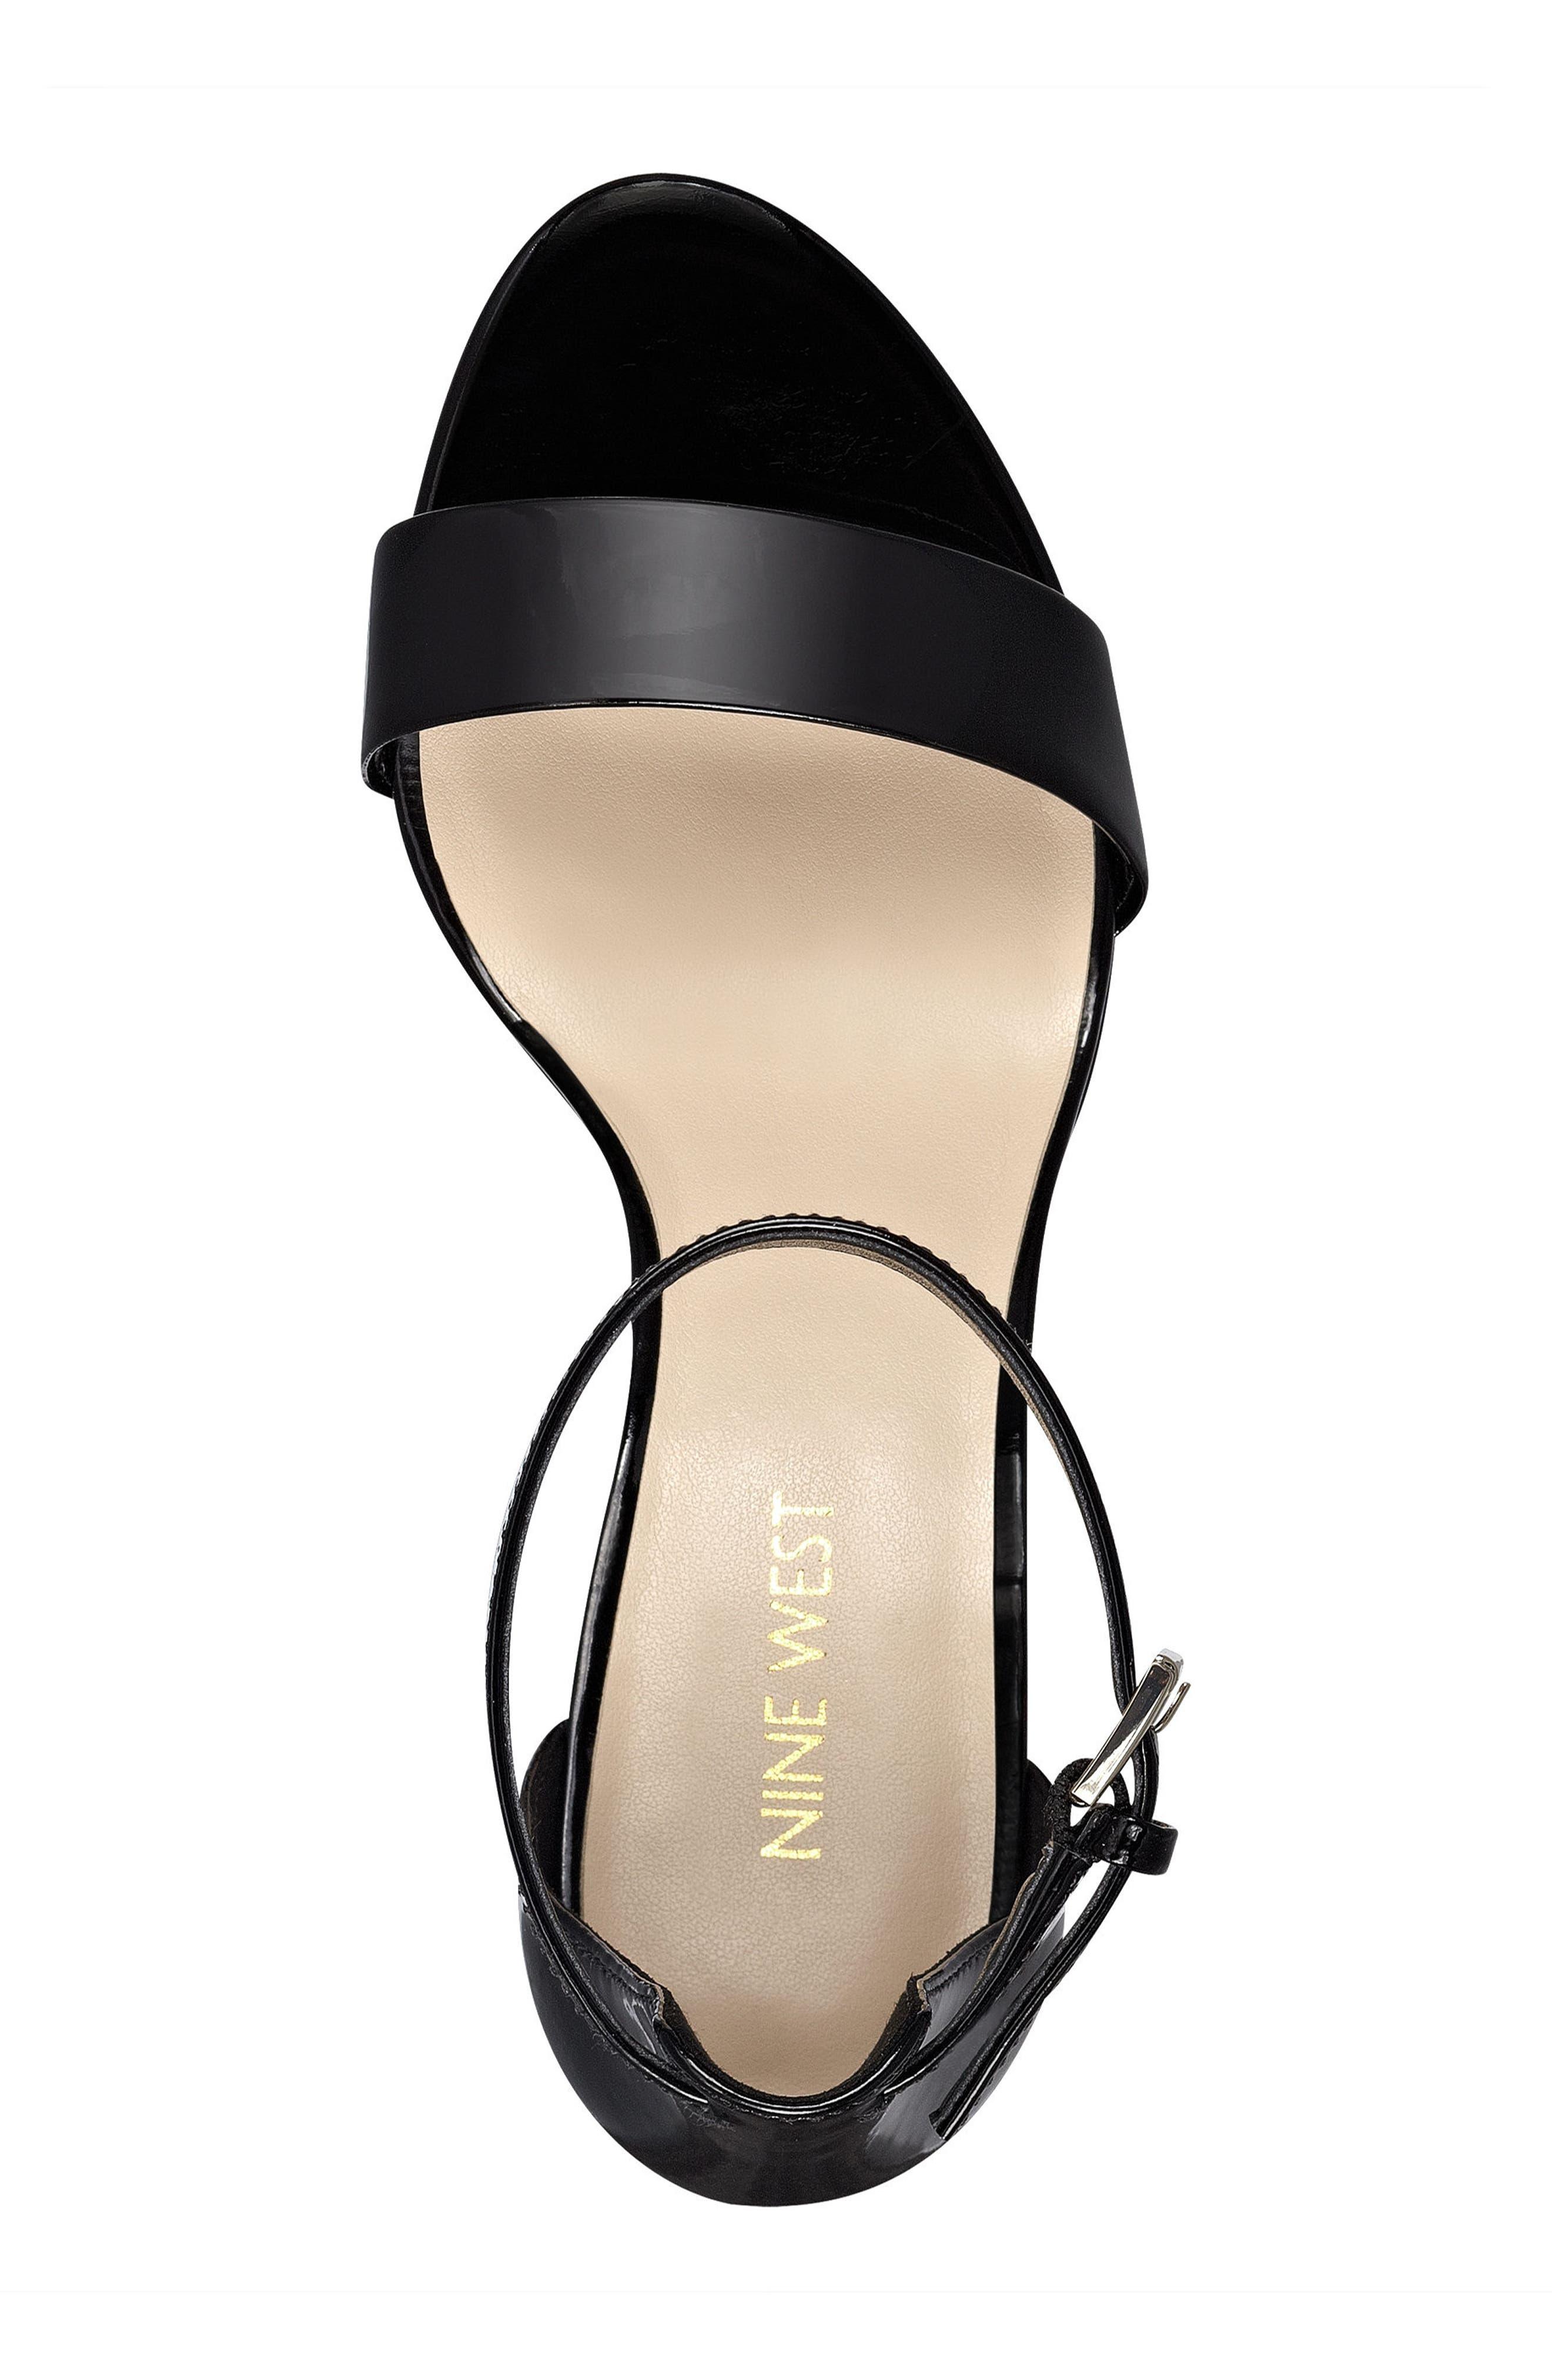 NINE WEST, Pruce Ankle Strap Sandal, Alternate thumbnail 5, color, BLACK PATENT